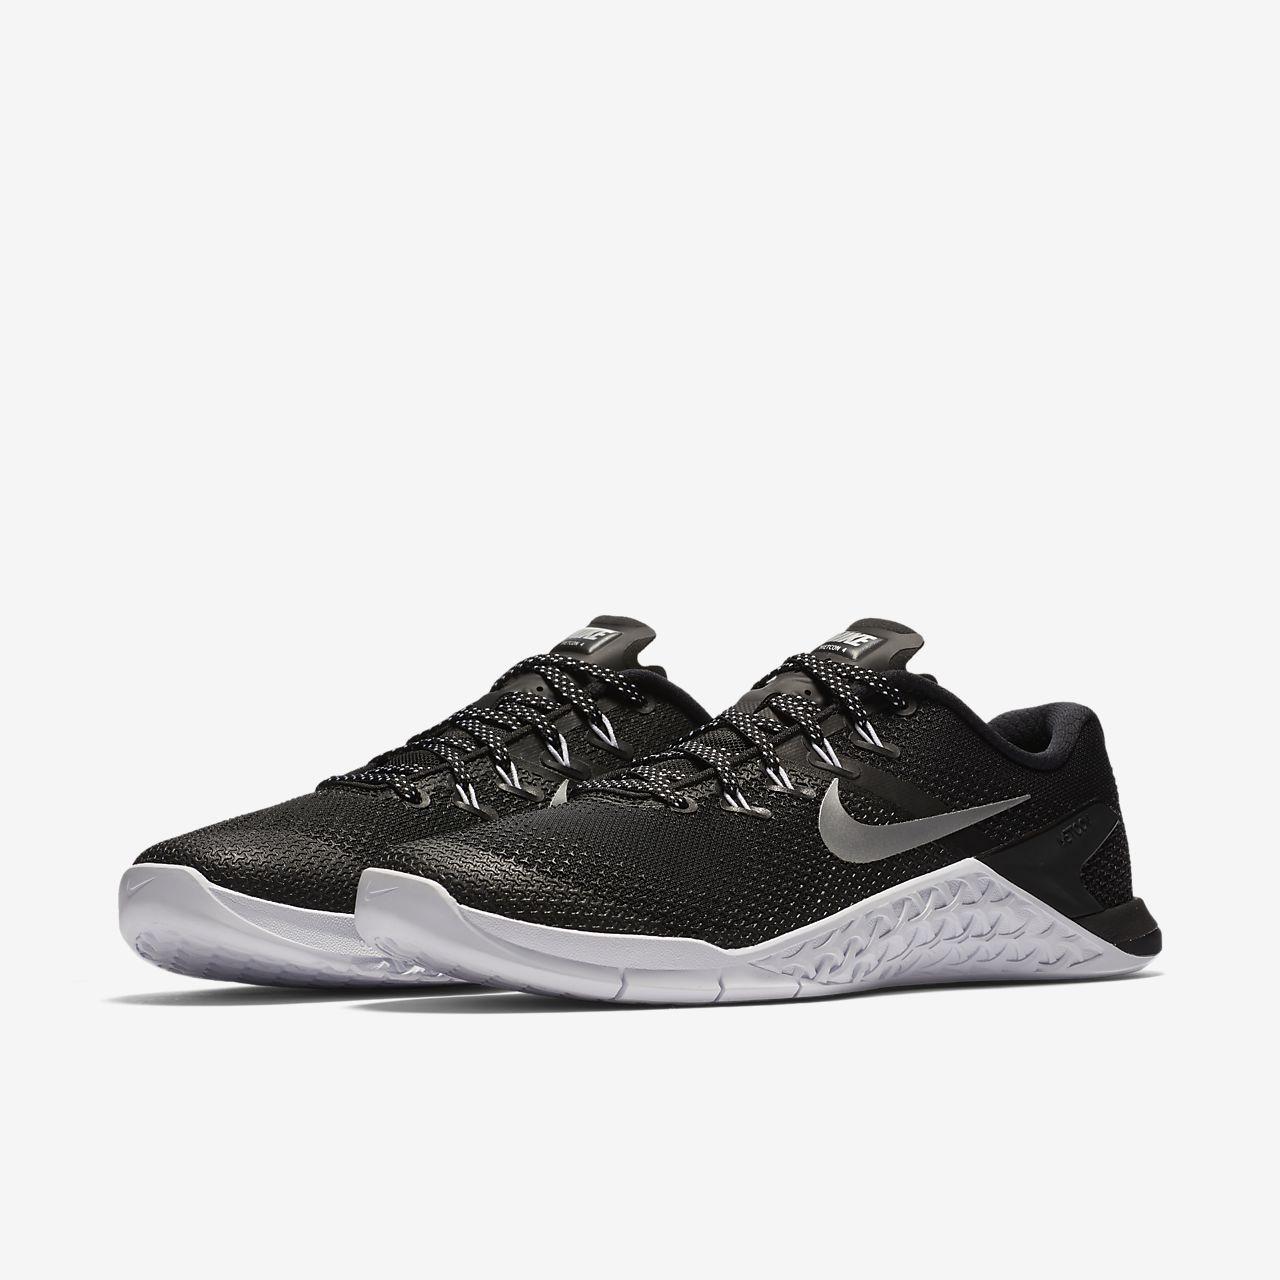 e434f93d480 Nike Metcon 4 Damesschoen voor crosstraining en gewichtheffen. Nike ...